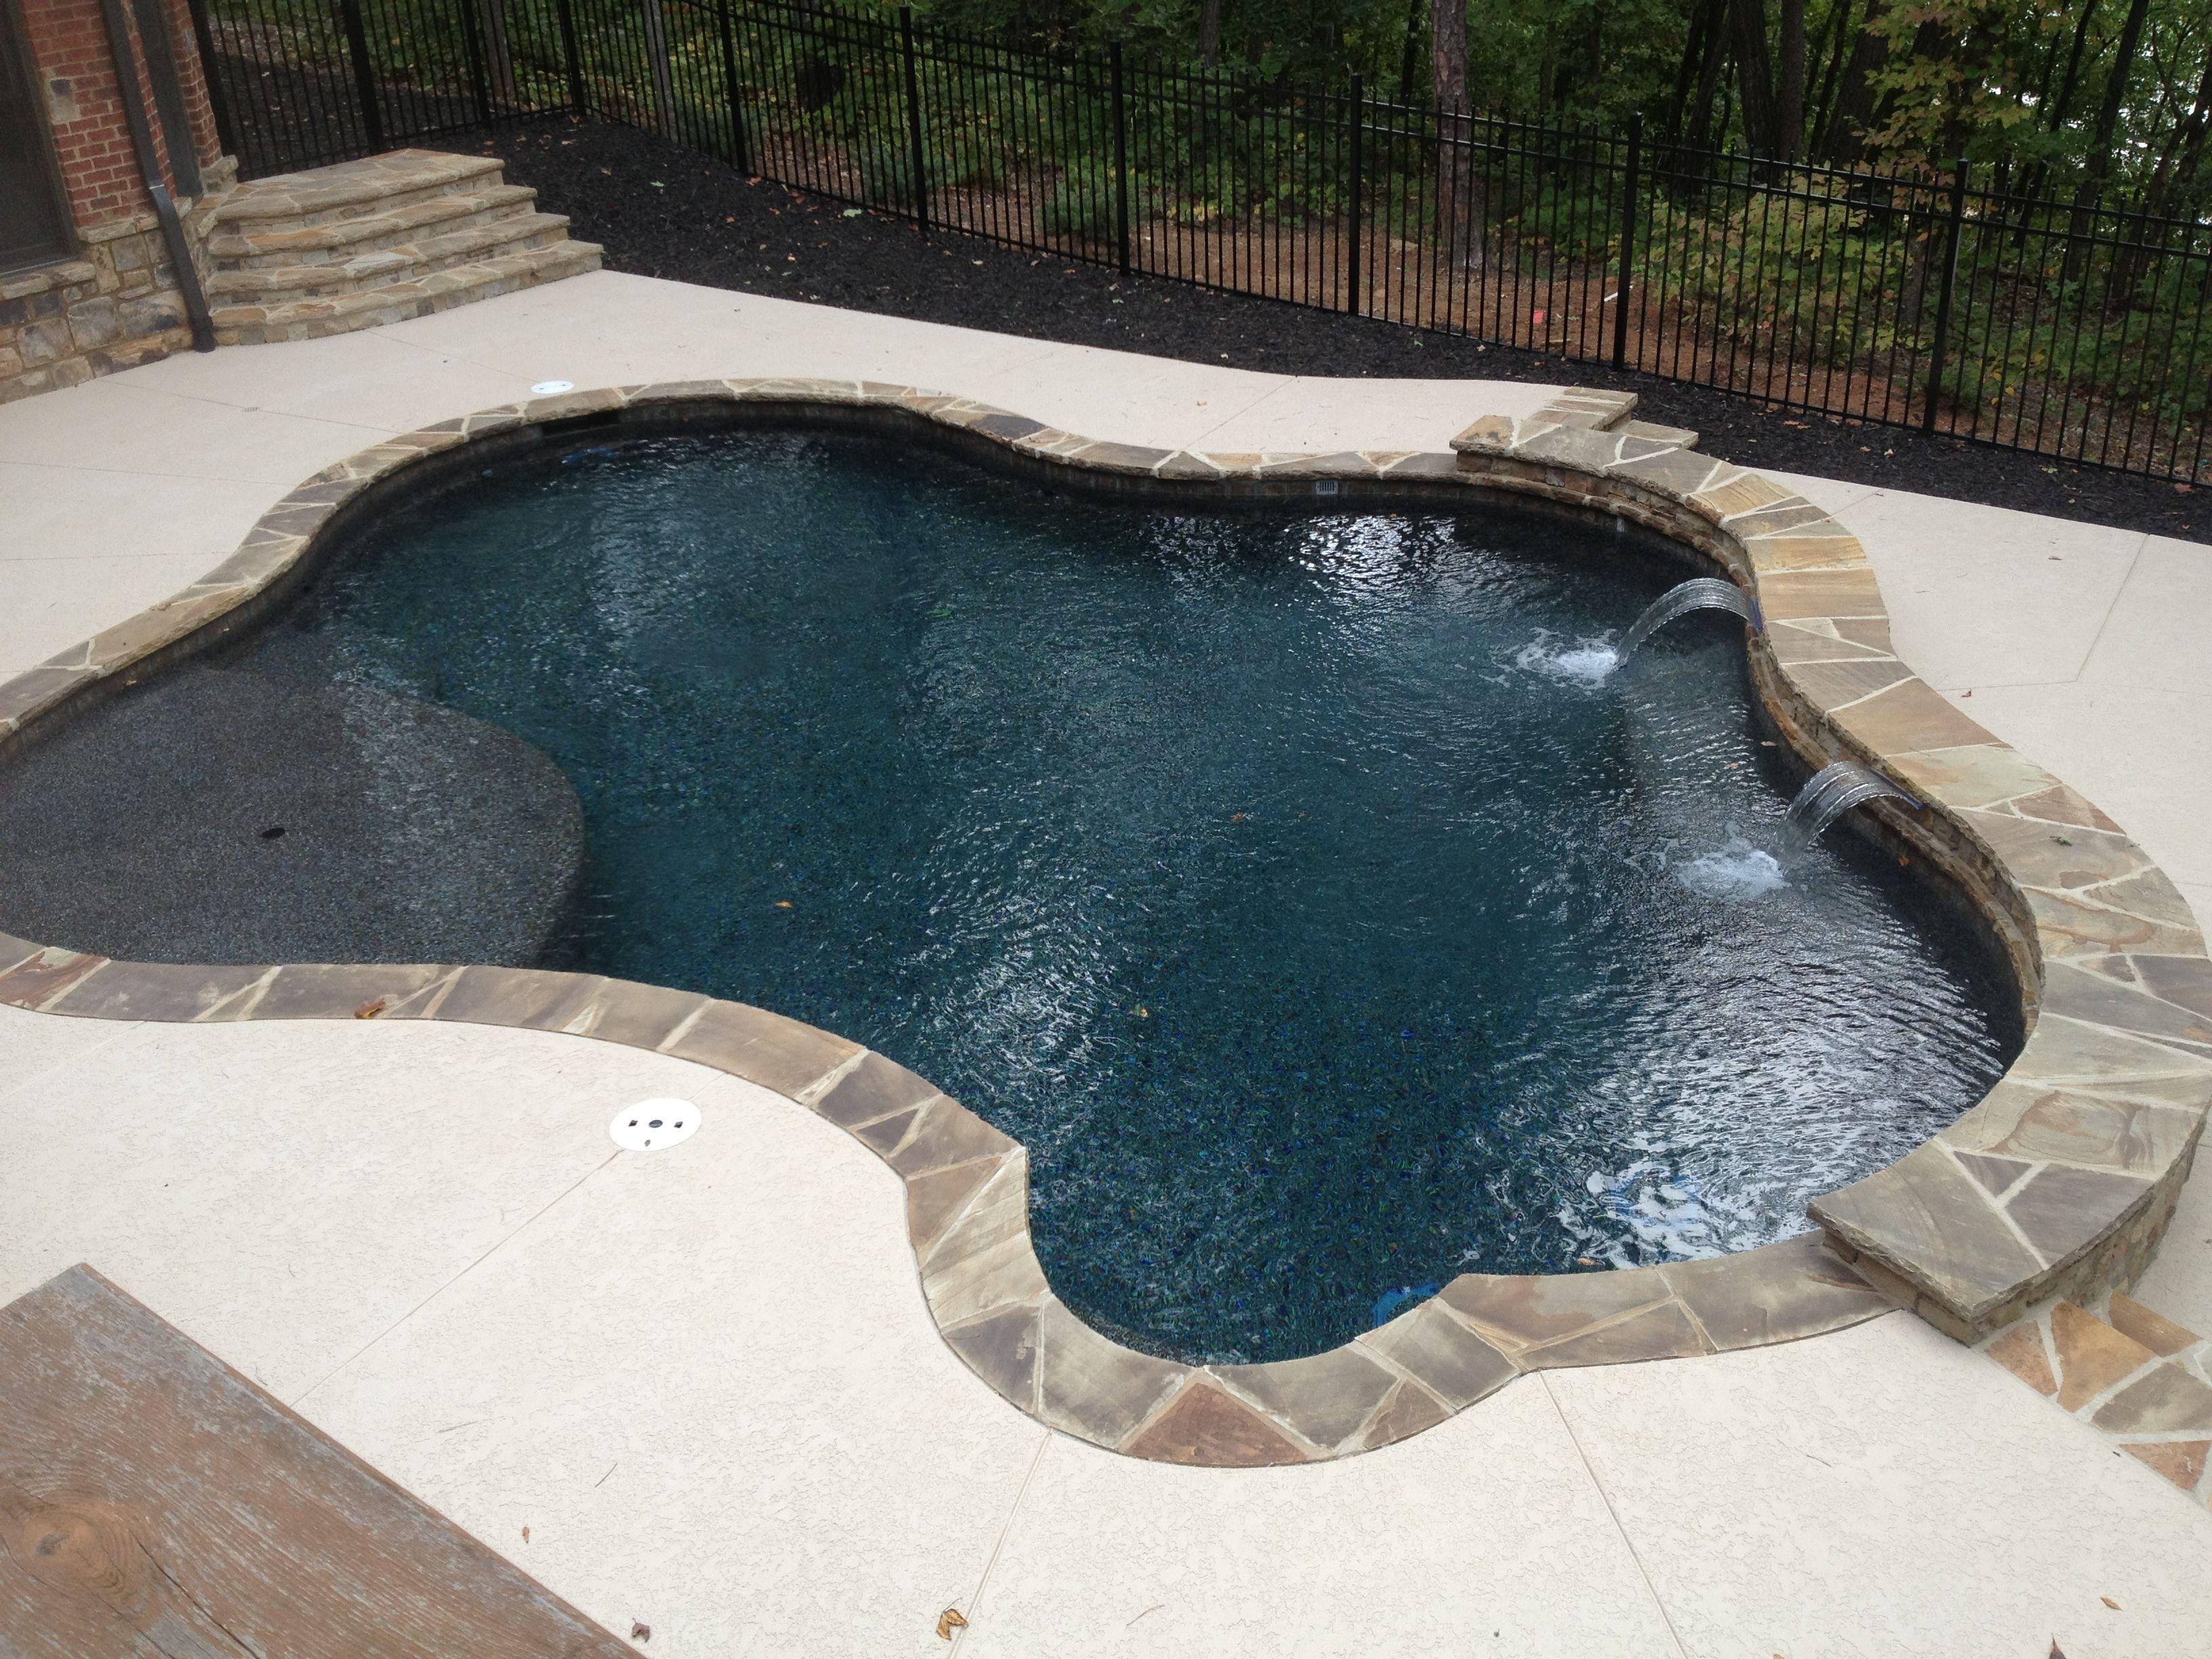 Black Marble Pebble Tec Rcs Pool And Spa Gunite Pools Pinterest Marbles Backyard And